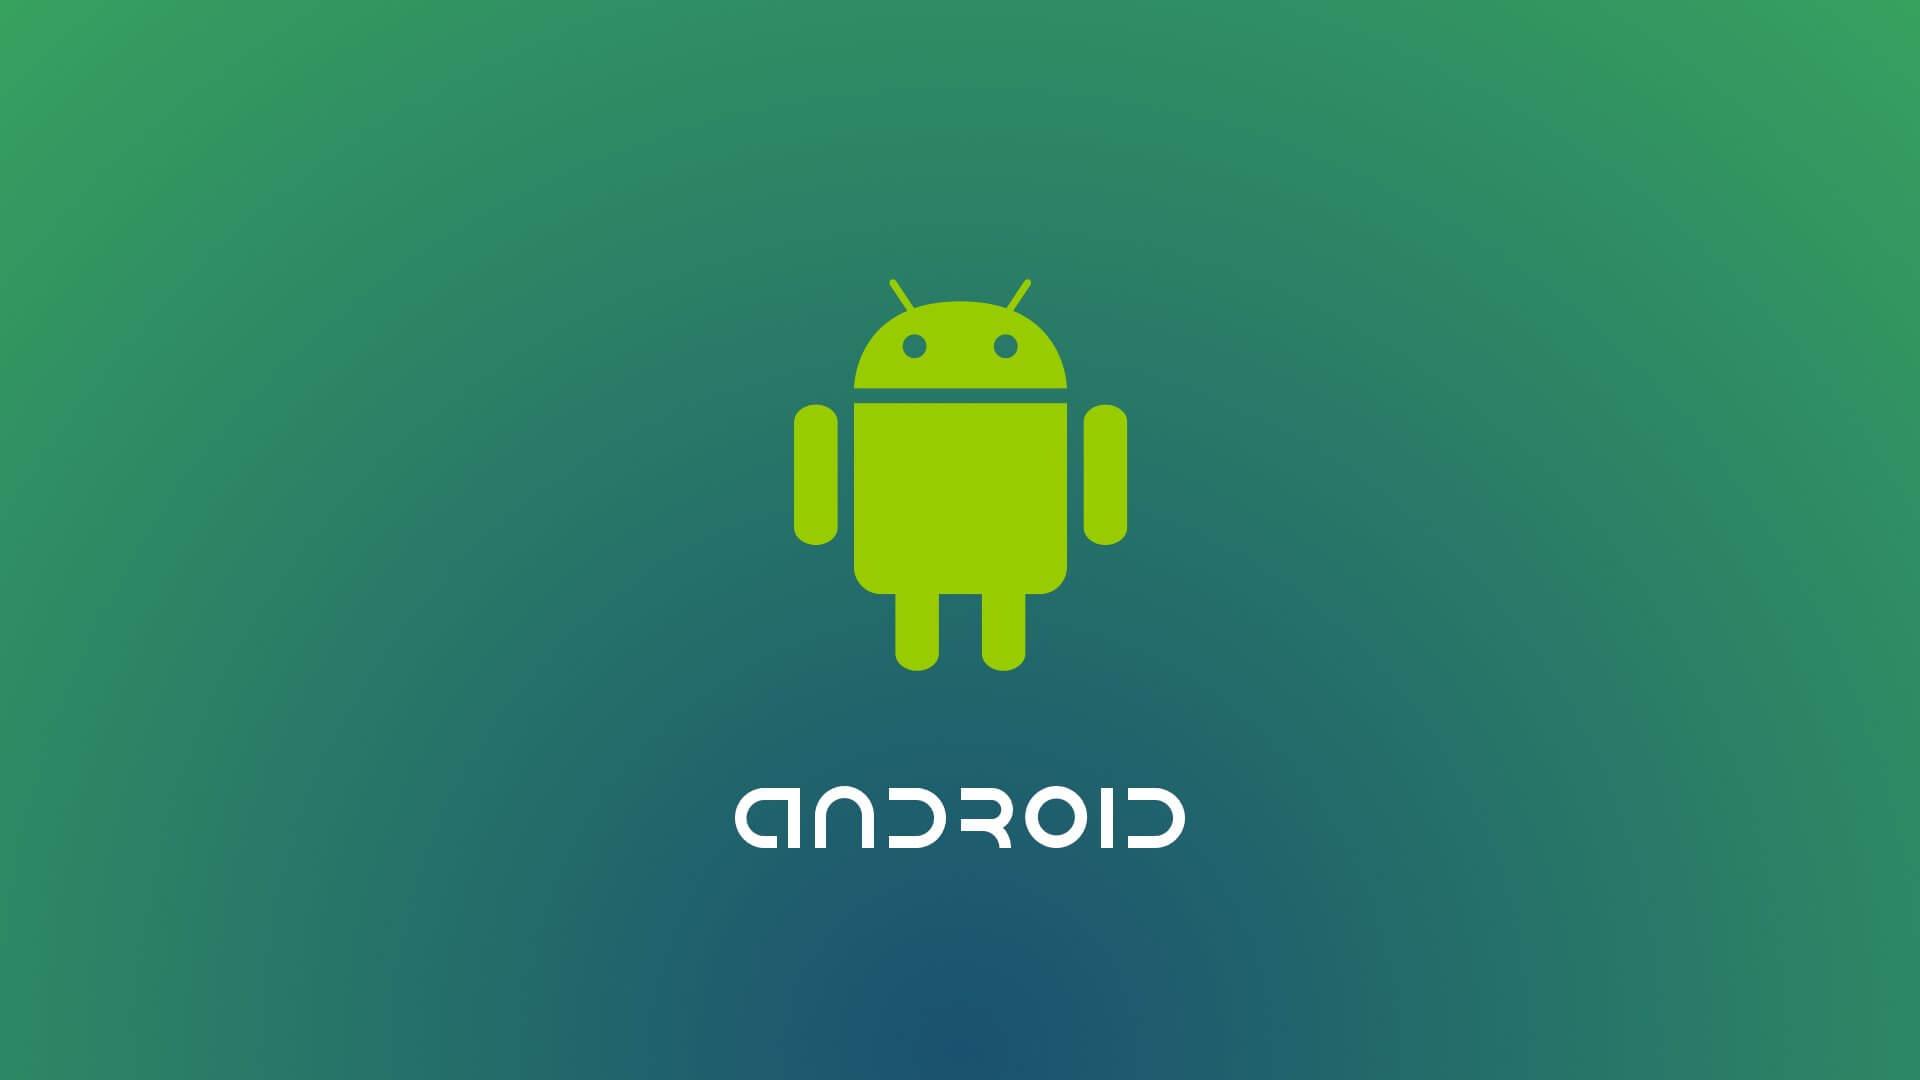 google-android-p-adli-yeni-isletim-sisteminin-kurulmasina-start-verdi